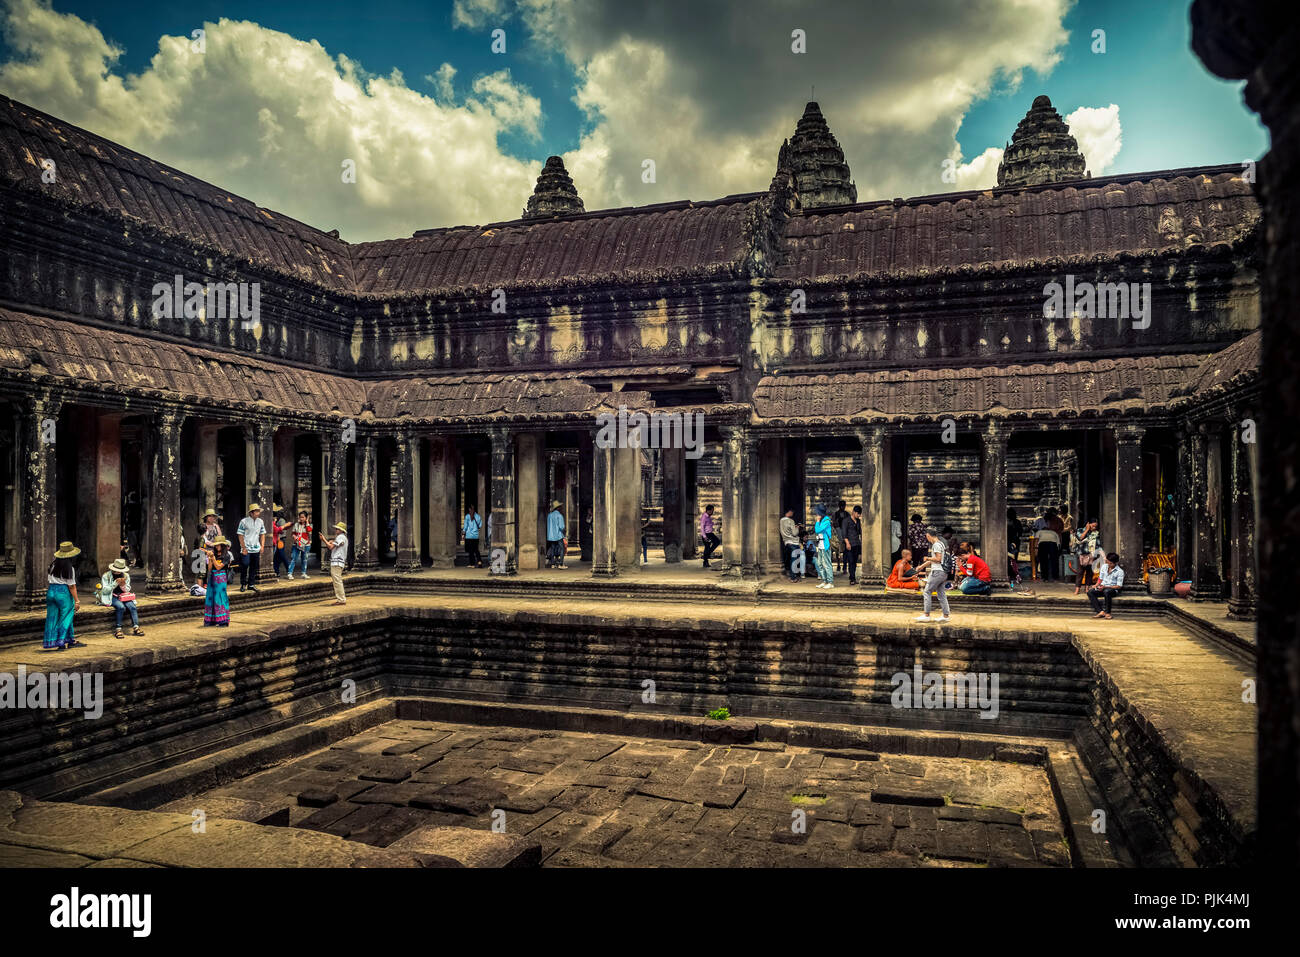 Asia, Cambodia, Angkor Wat, Temple, Courtyard - Stock Image